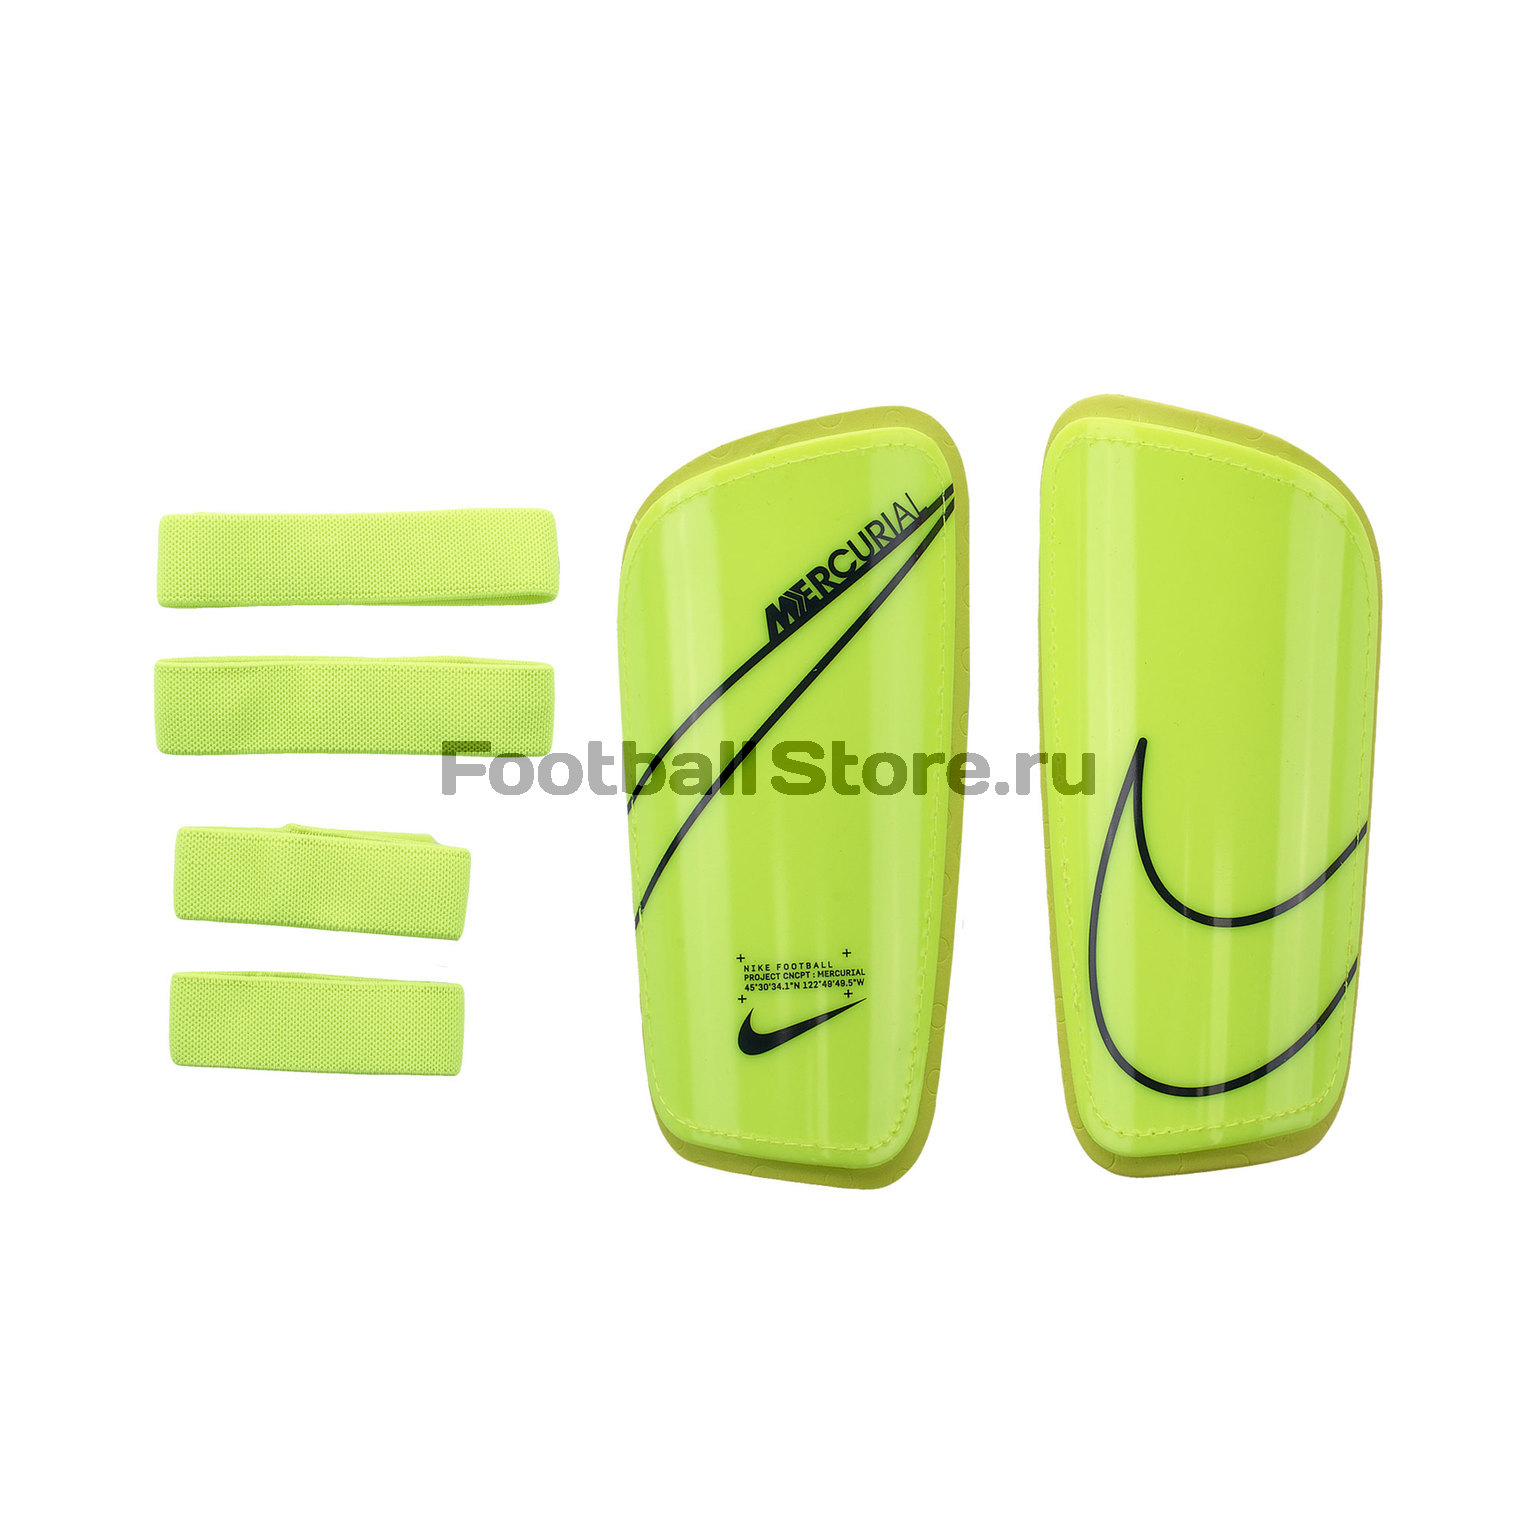 Щитки Nike Mercurial Hardshell SP2128-703 обувь для зала nike mercurial x finale ii ic 831974 616